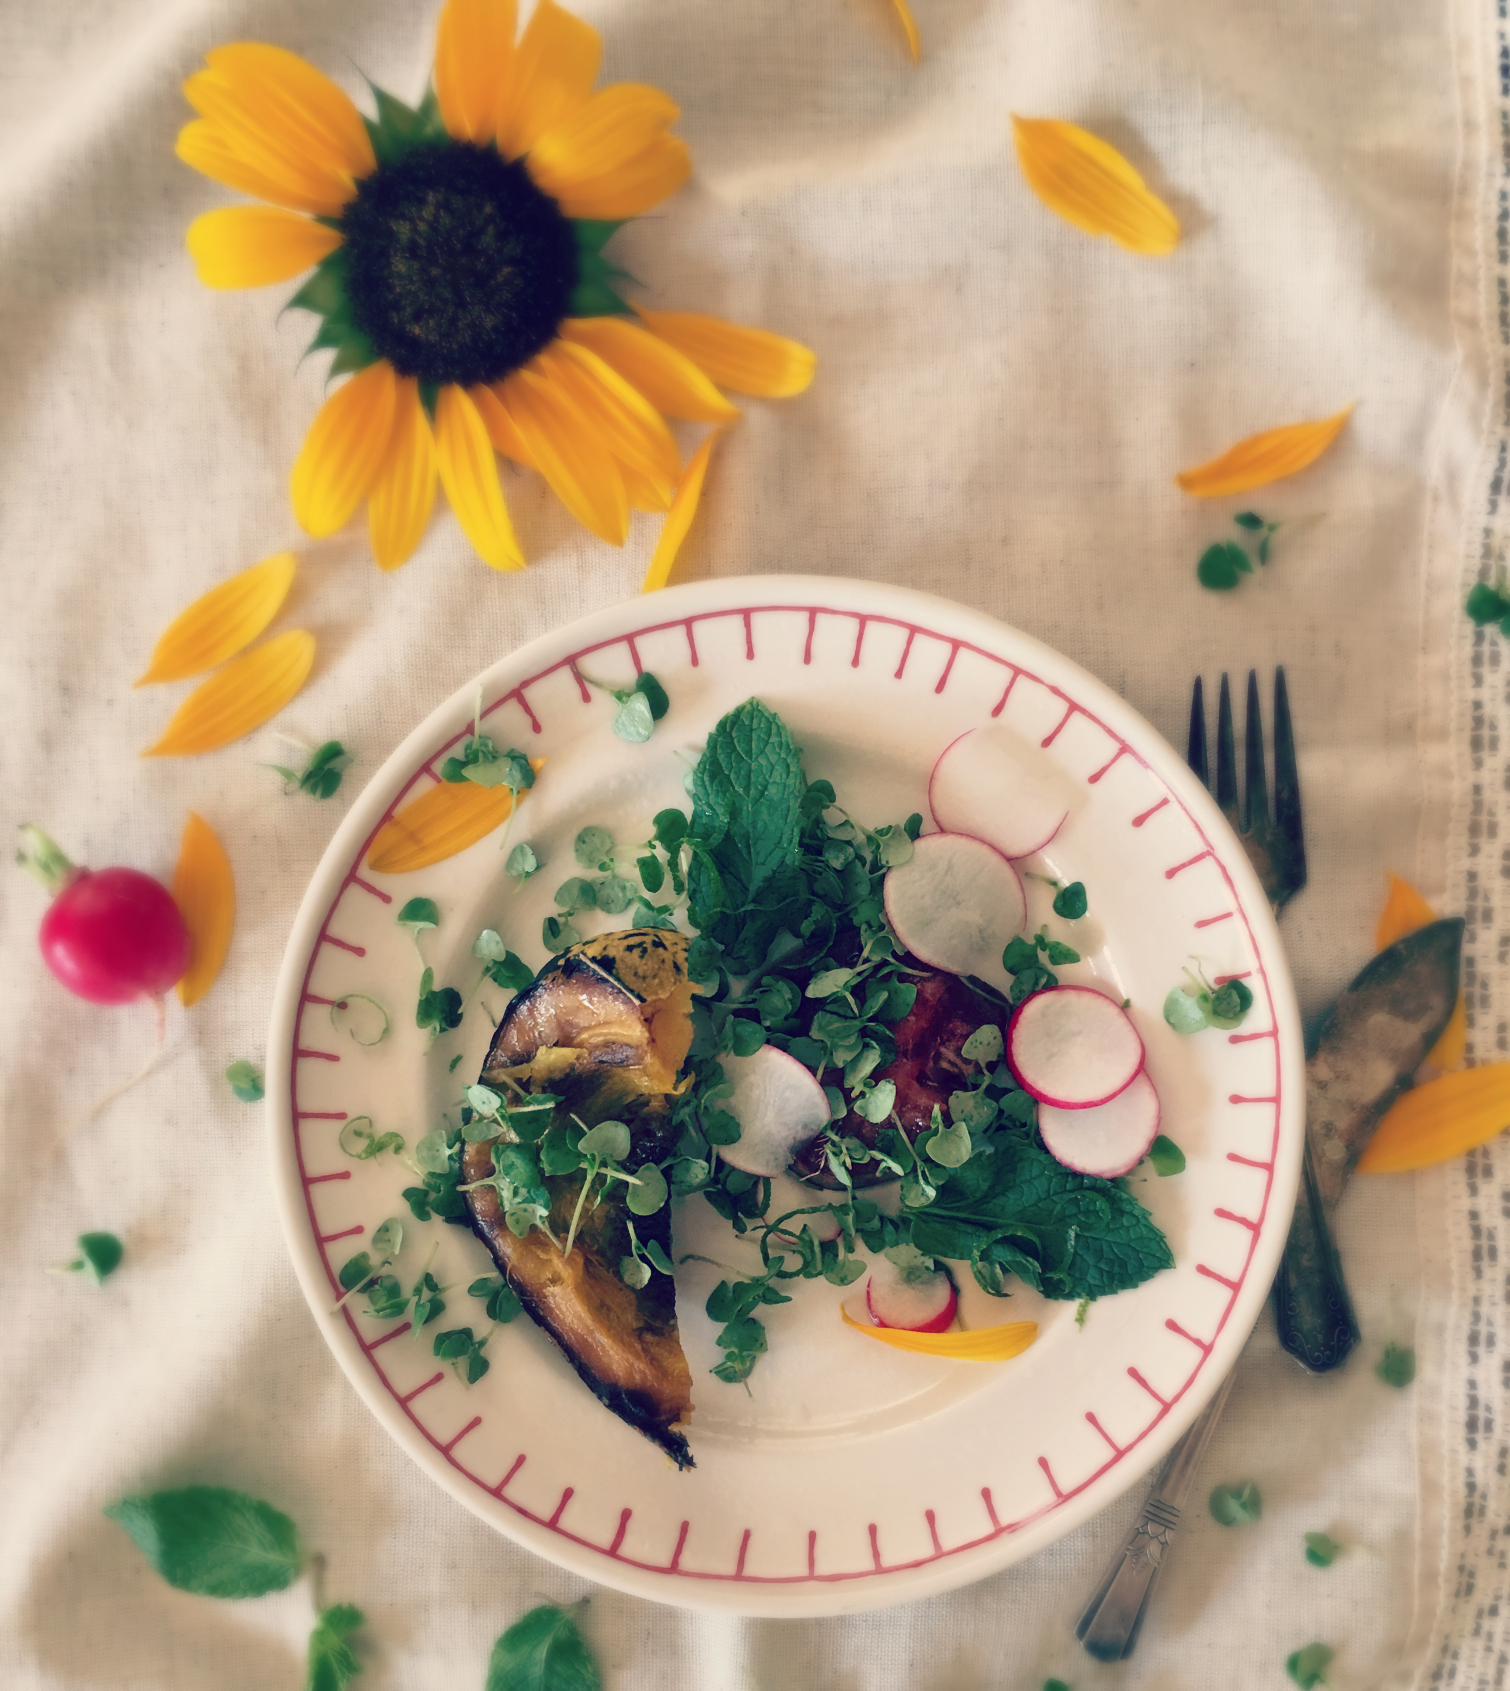 © Softened Salad Scene with Sunflower by Dena T Bray.jpg